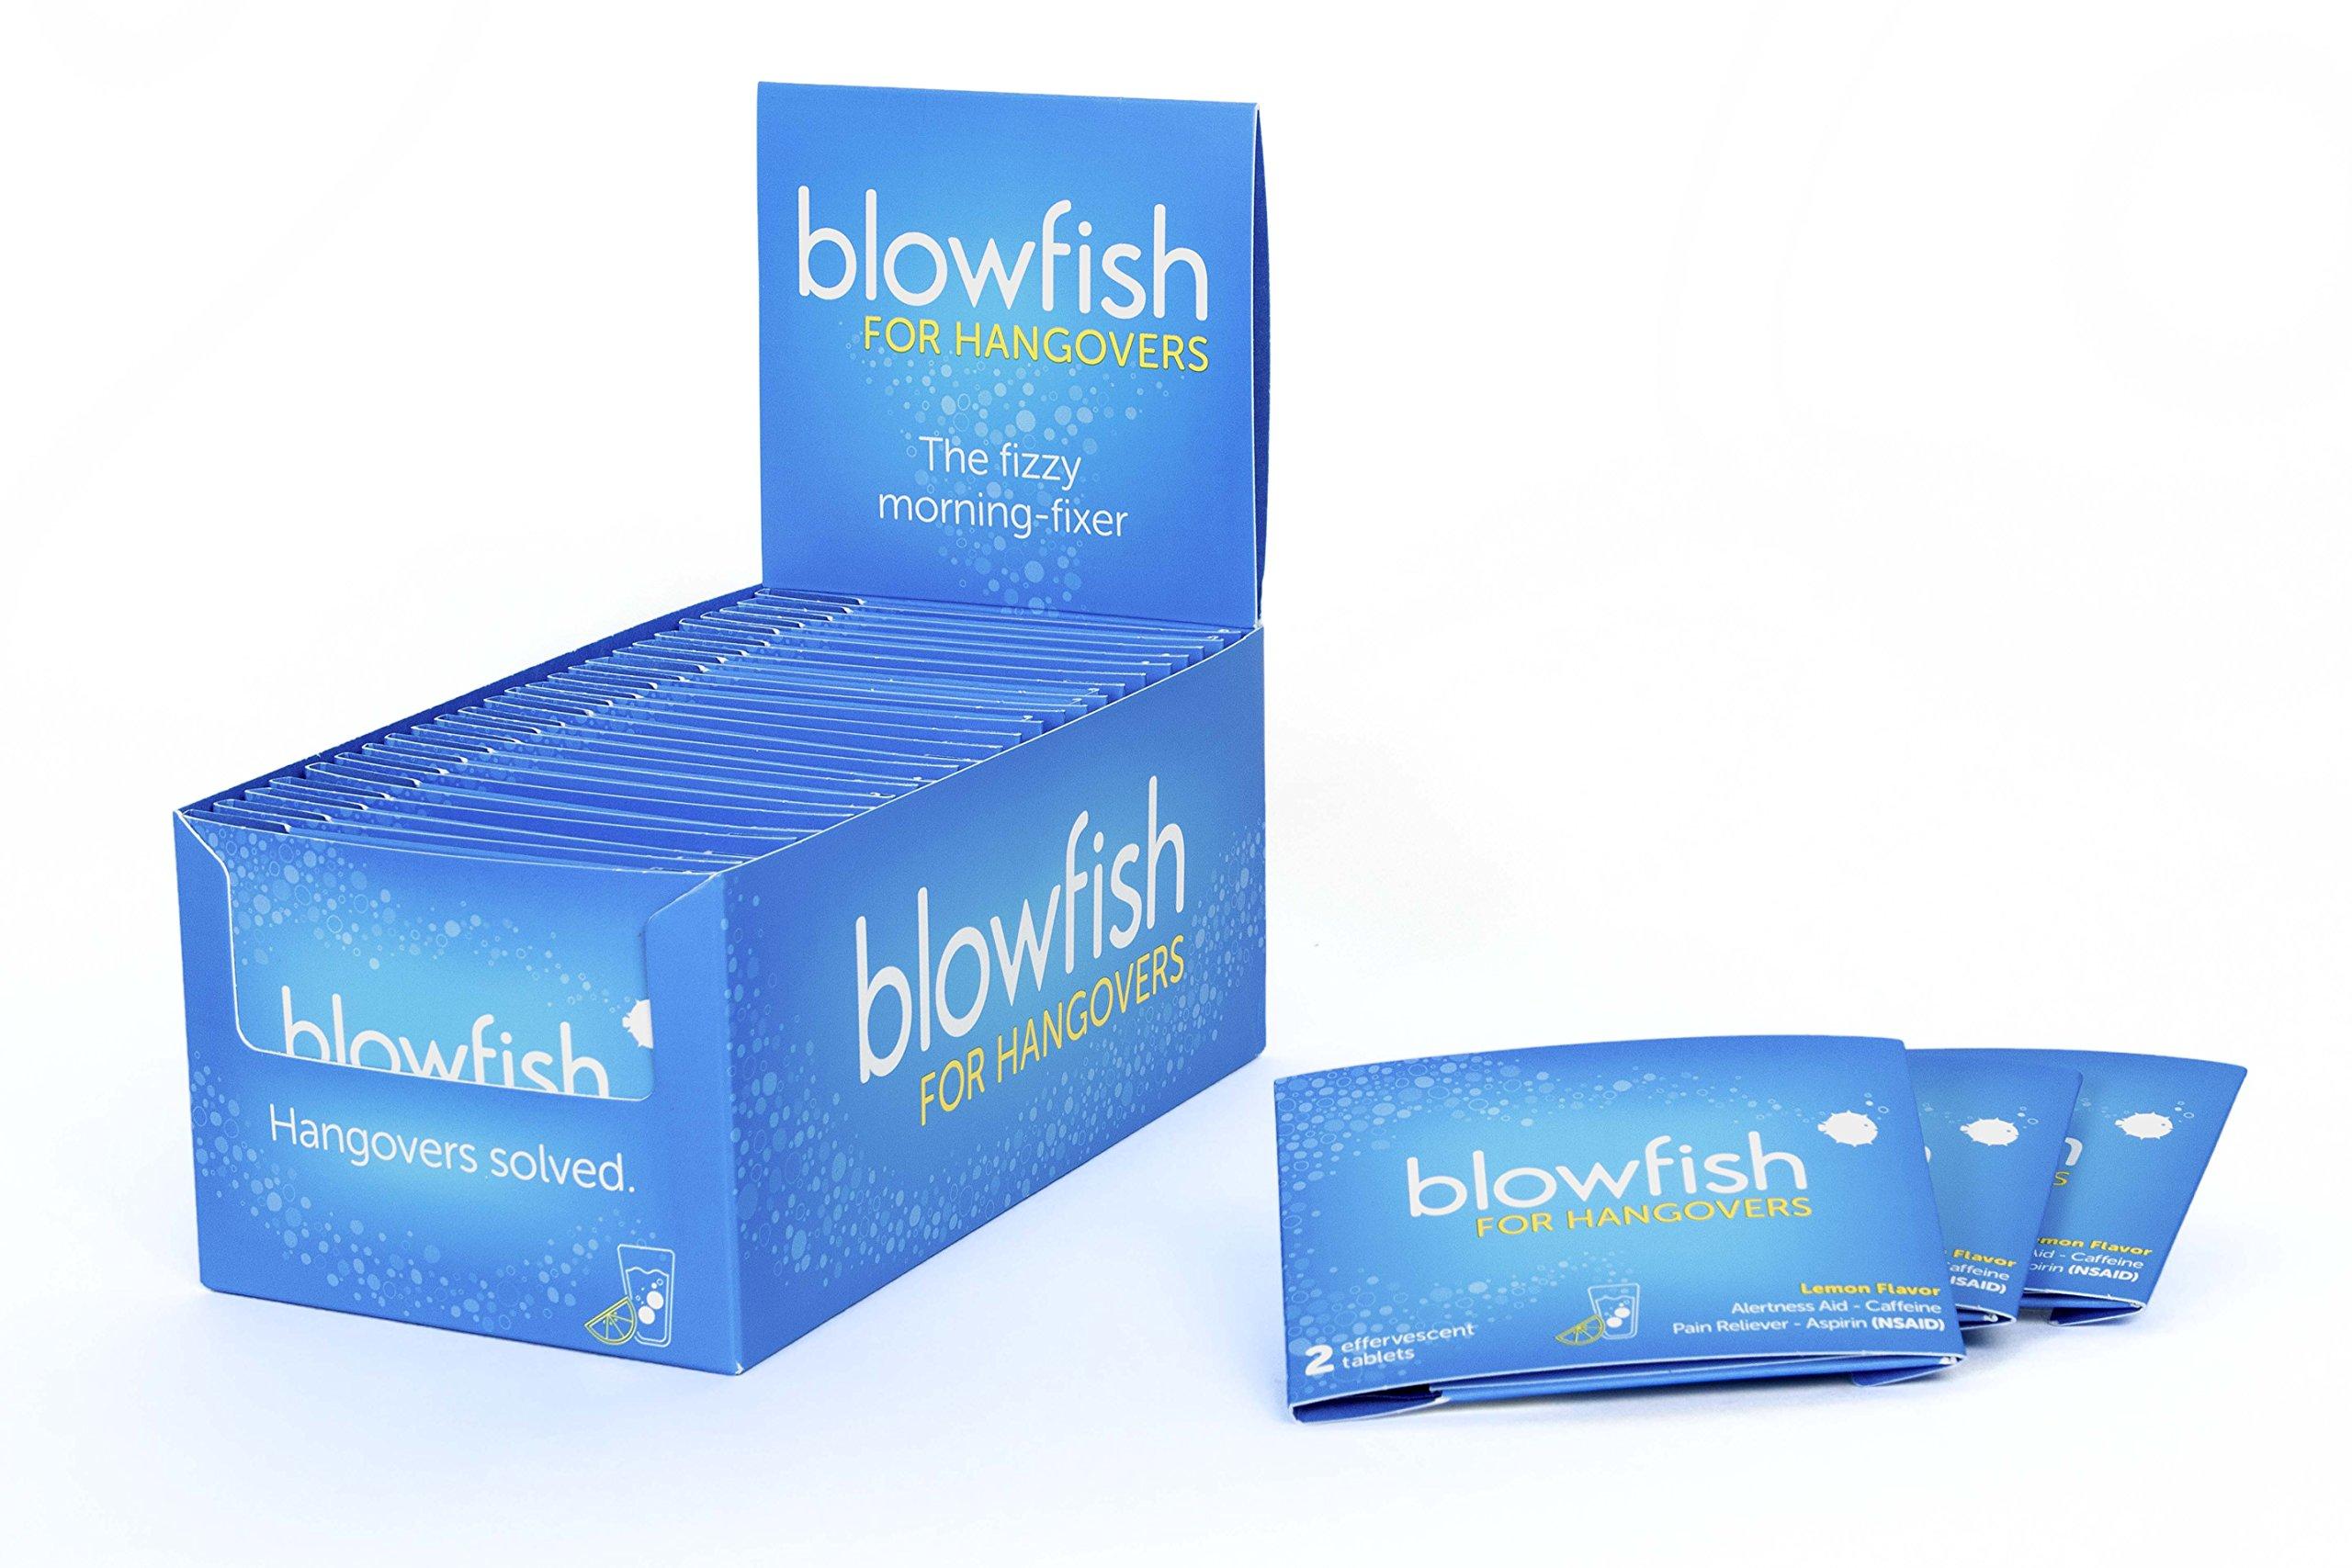 Blowfish for Hangovers - 25 Single Packs